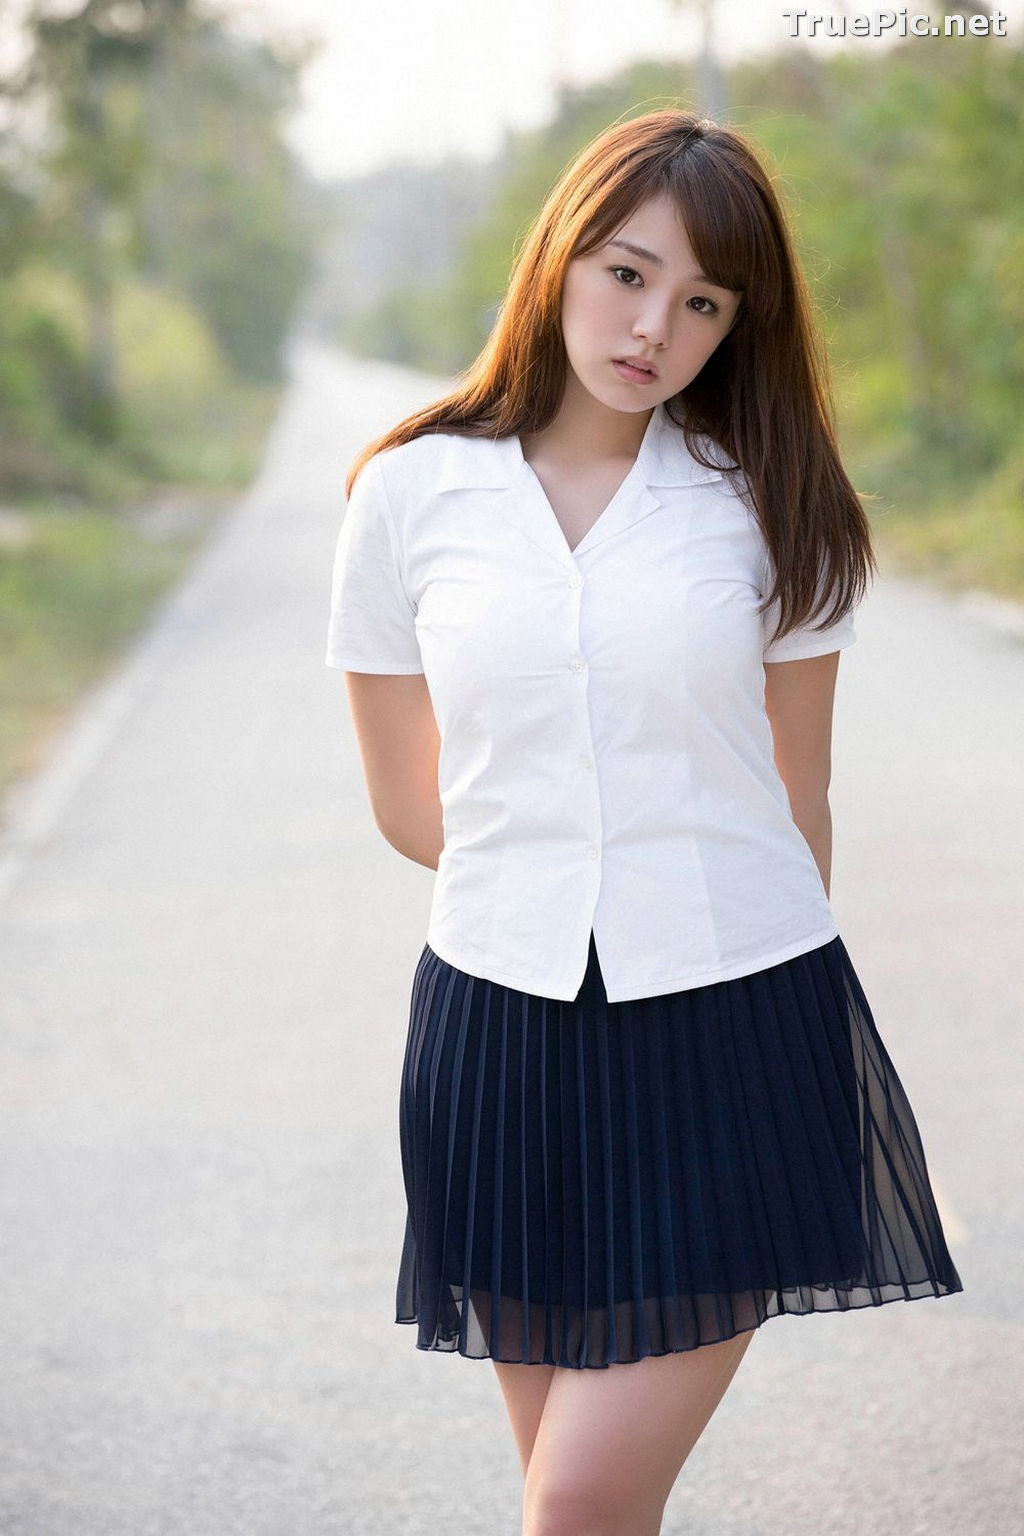 Image [YS Web] Vol.560 - Japanese Gravure Idol and Singer - Ai Shinozaki - TruePic.net - Picture-4